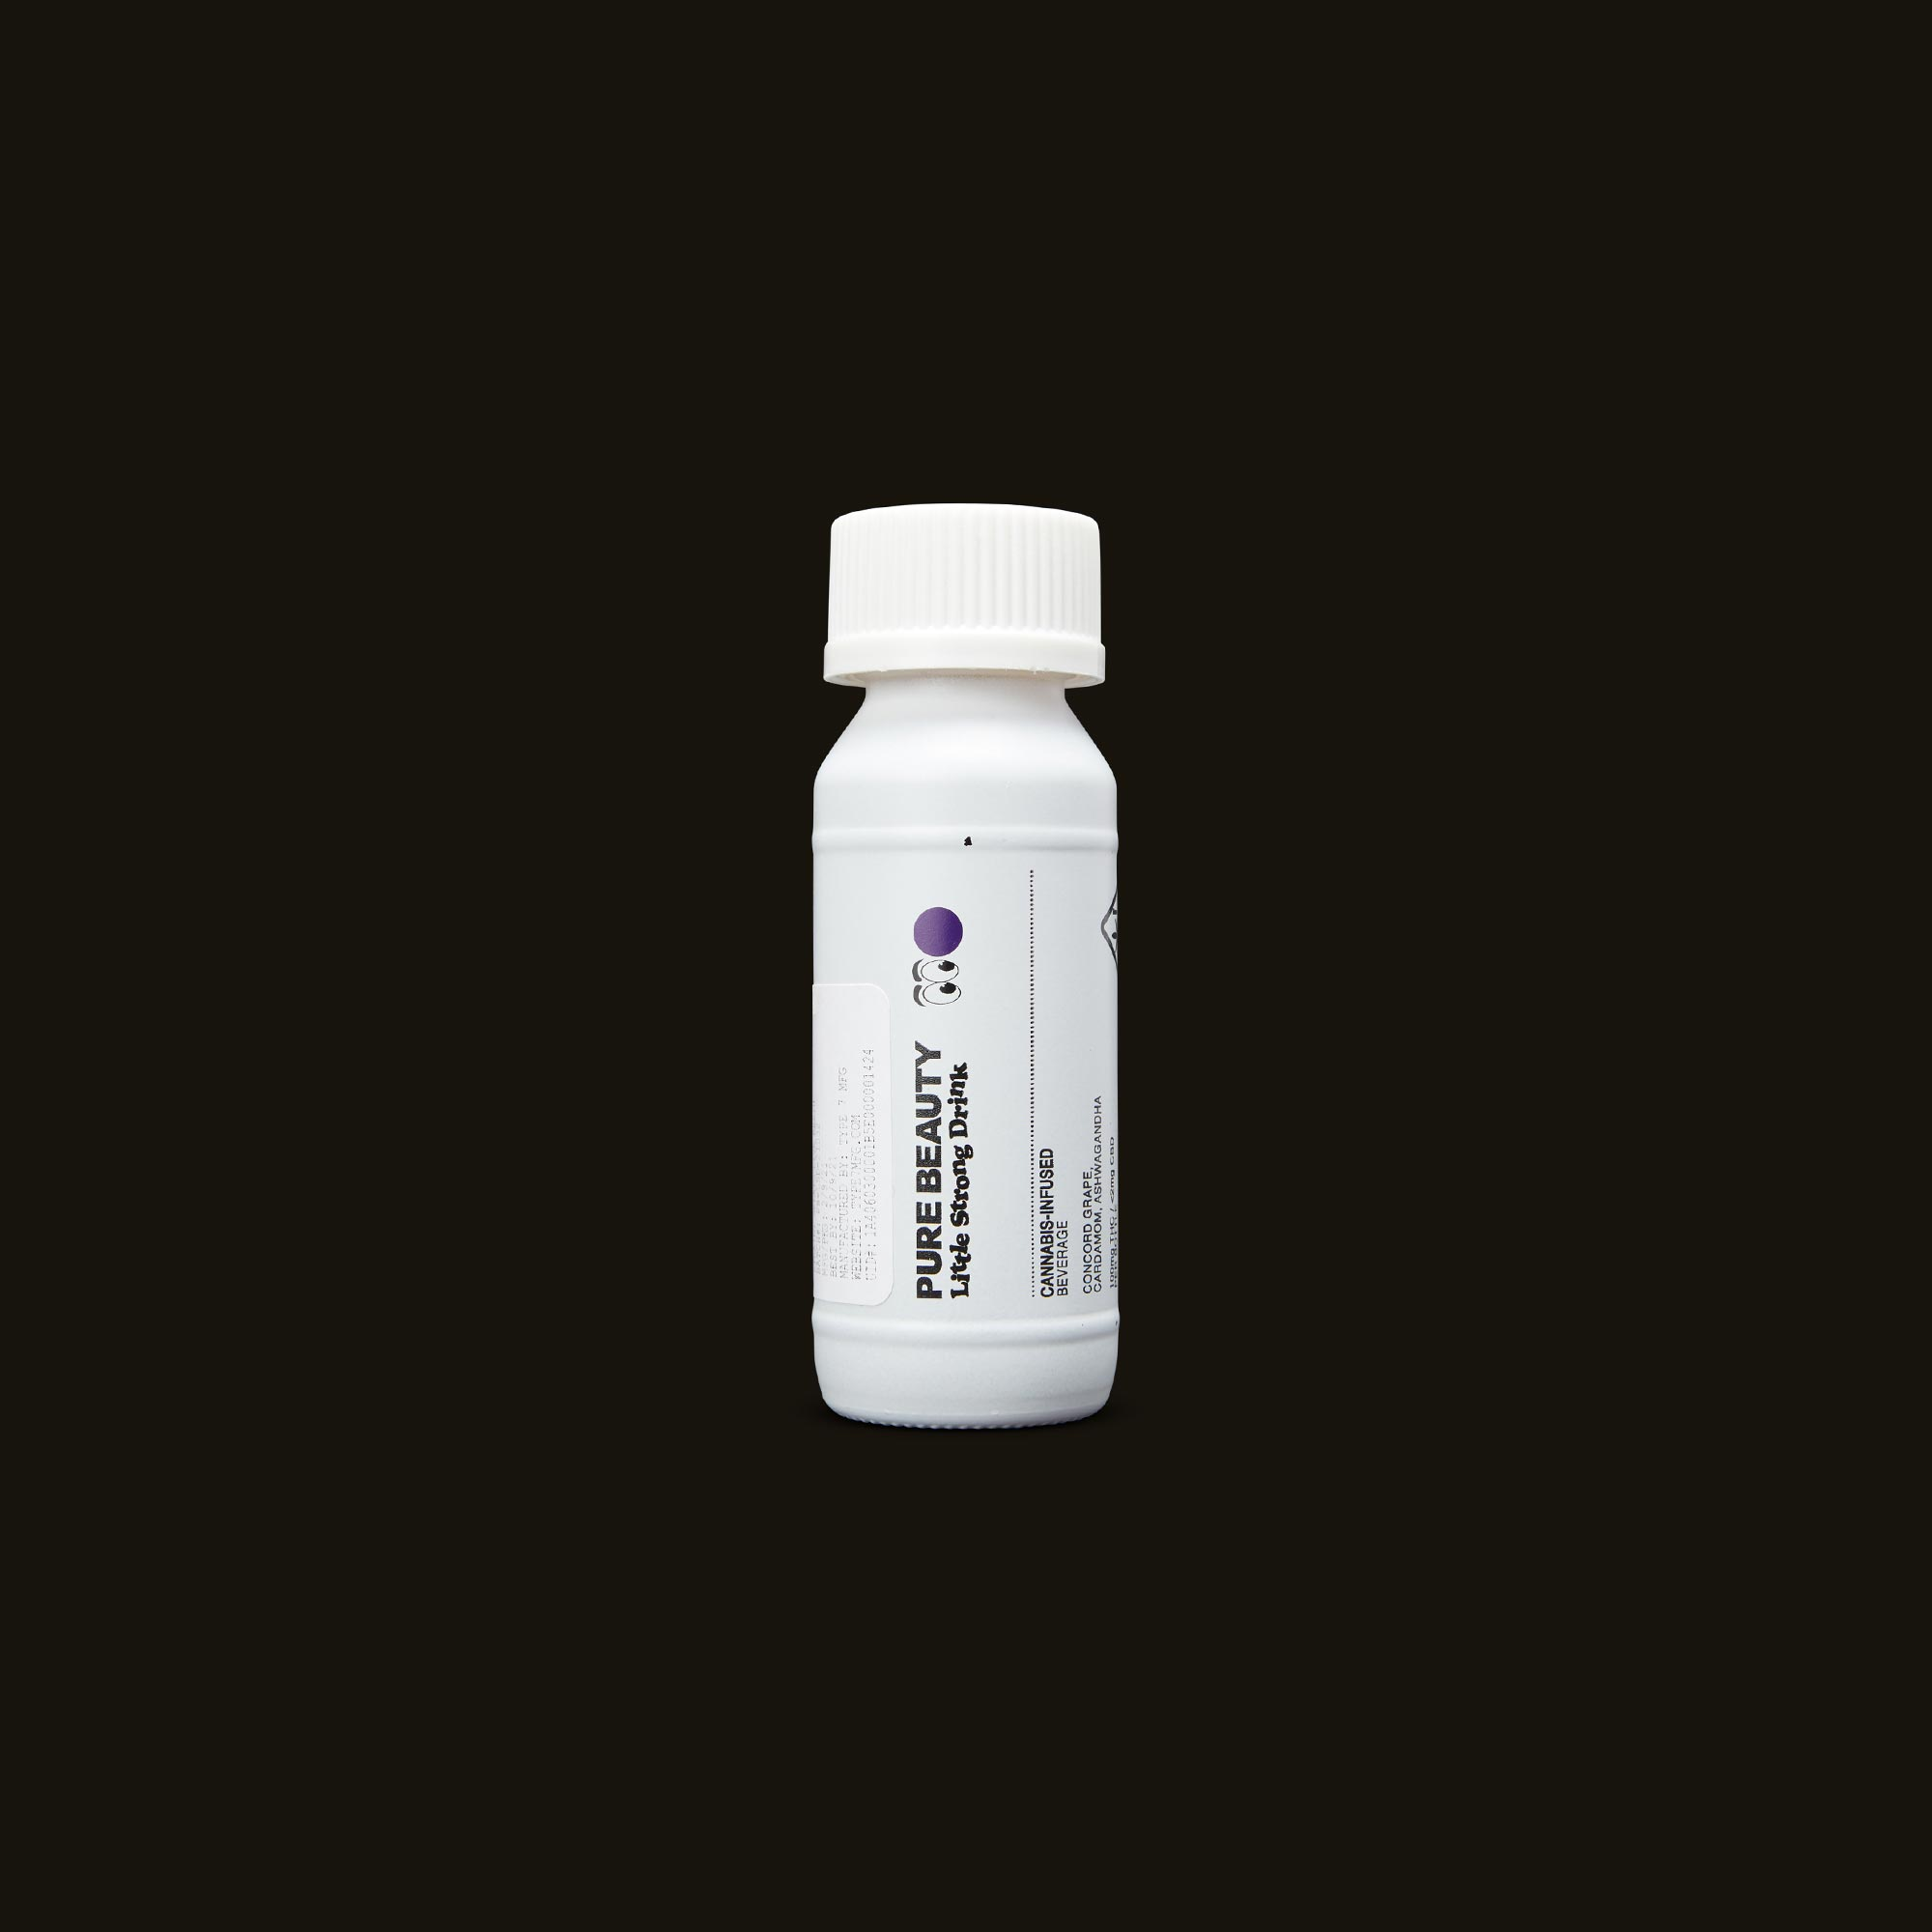 Little Strong Drink - One 2.2fl oz bottle (100mg THC)